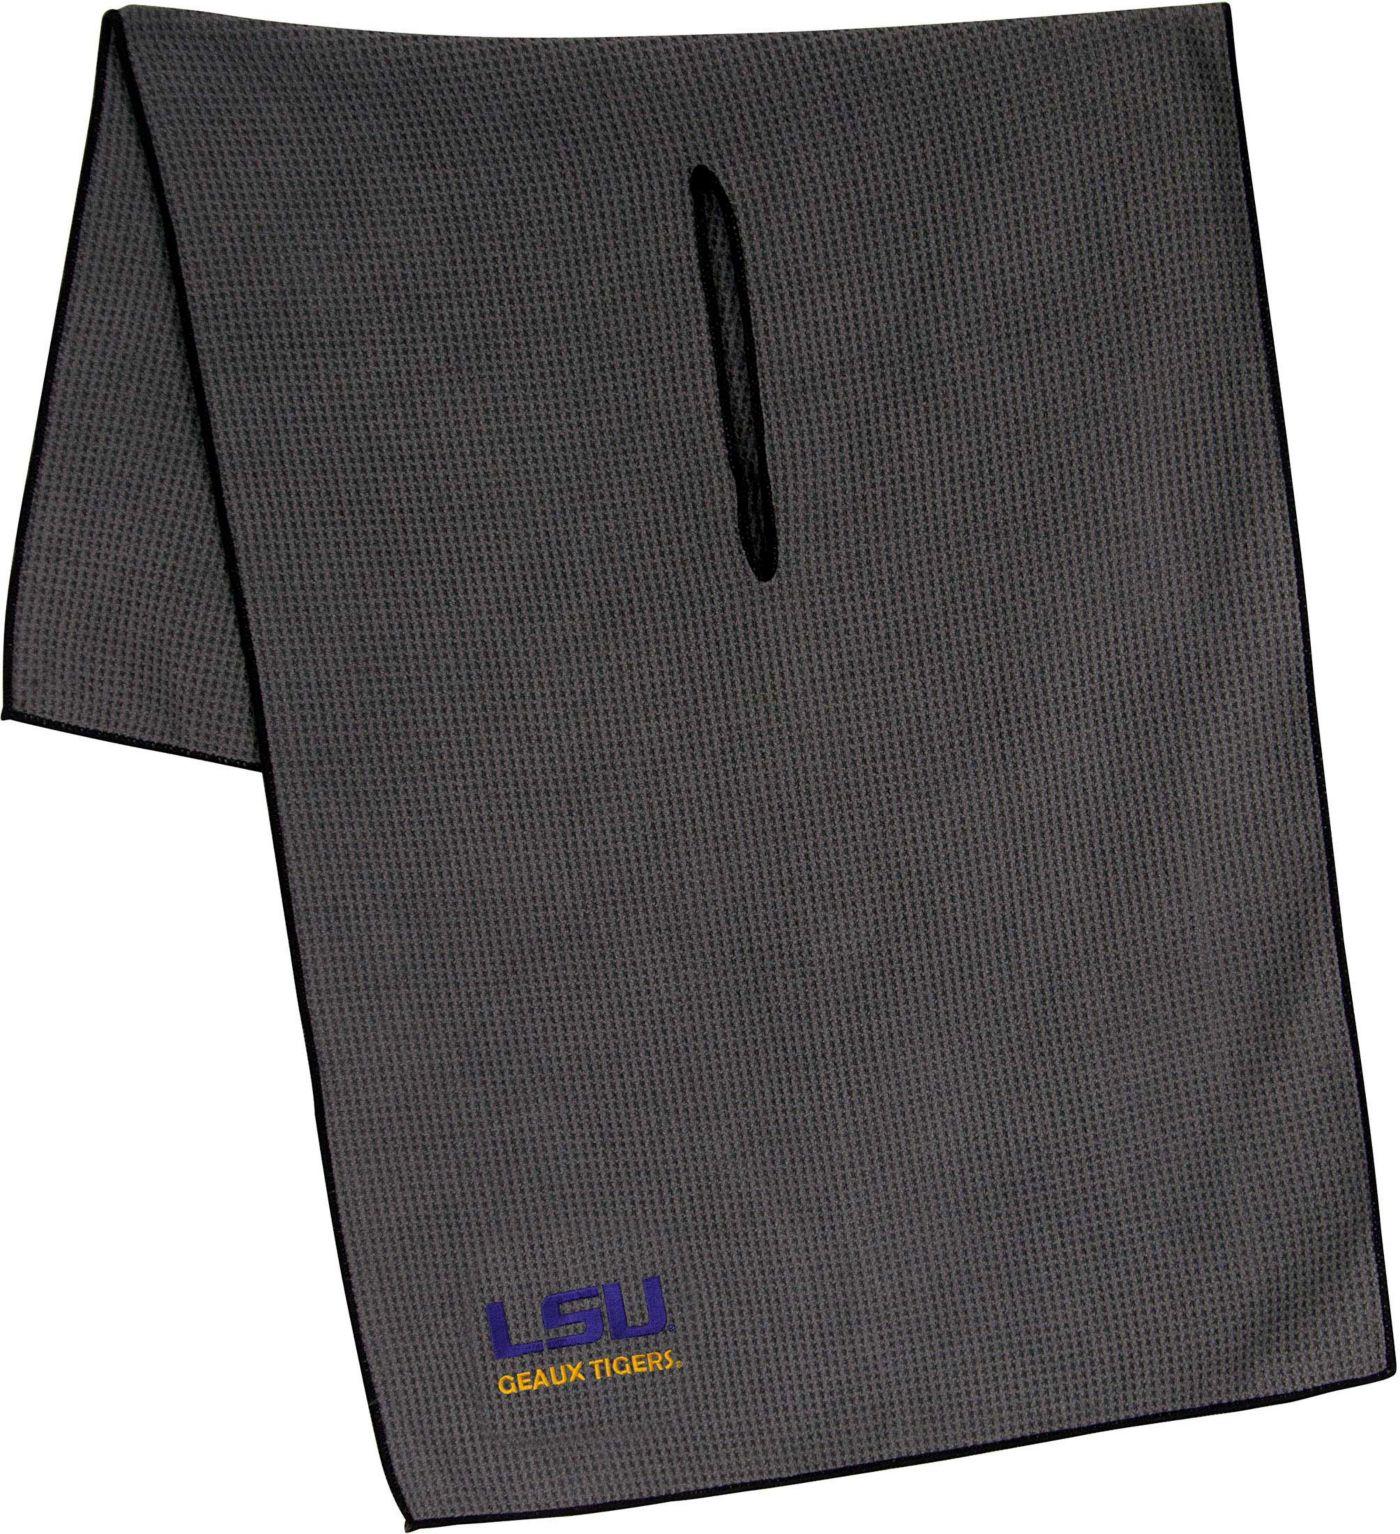 "Team Effort LSU Tigers 19"" x 41"" Microfiber Golf Towel"